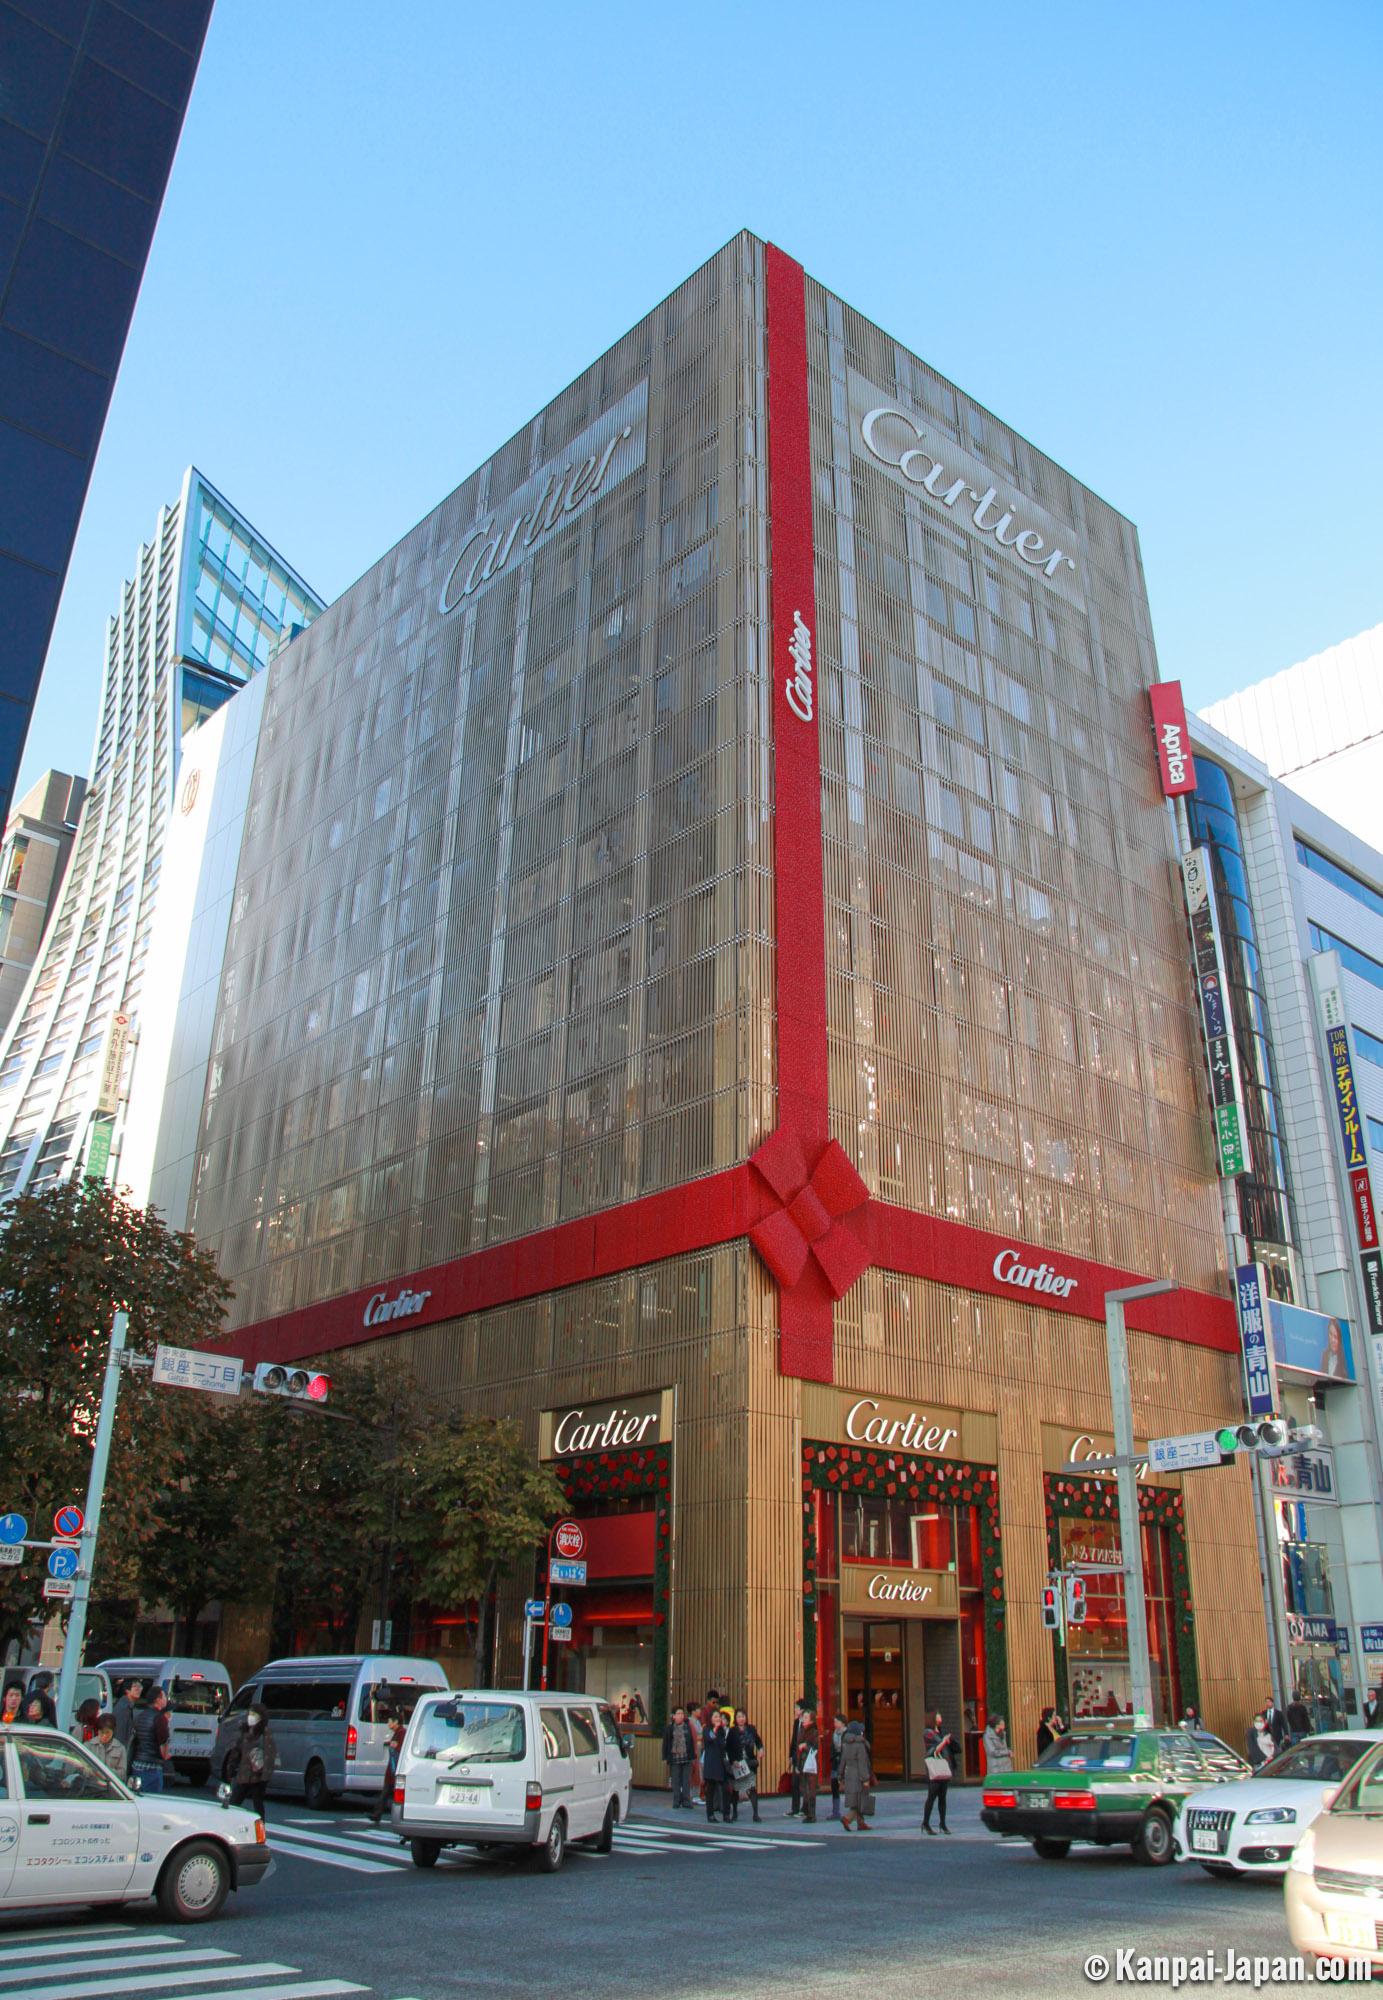 Ginza - Luxury shopping in Tokyo